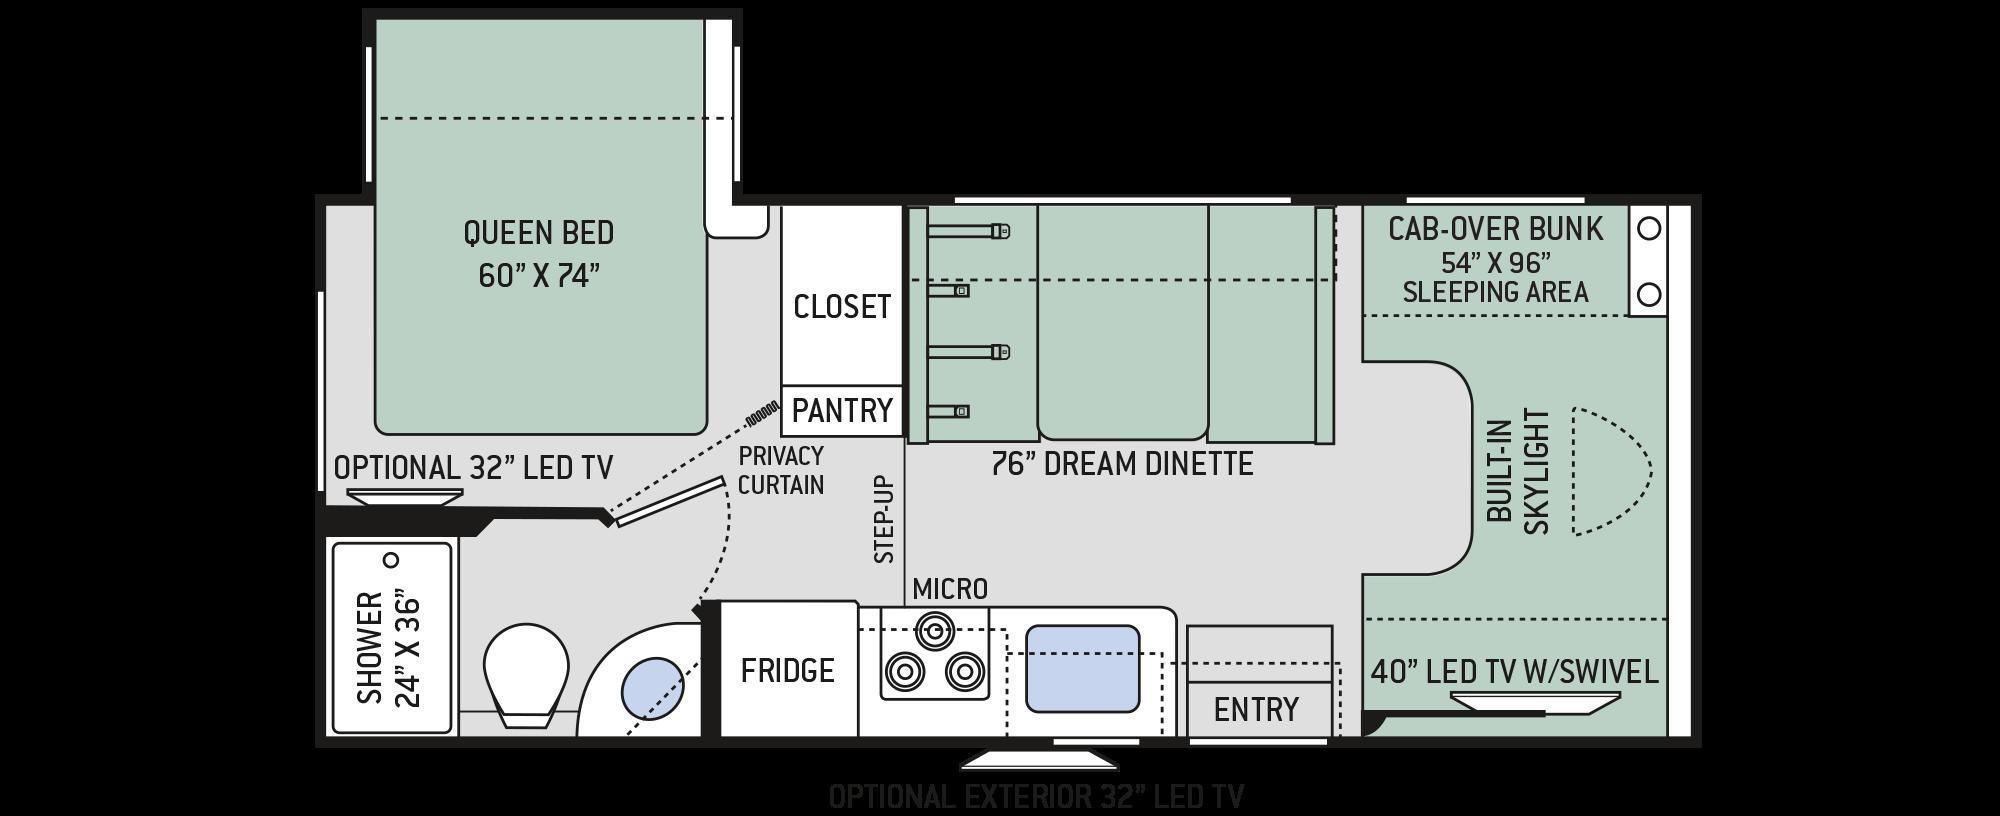 Floor plans quantum gr22 for Floor plans quantum bay